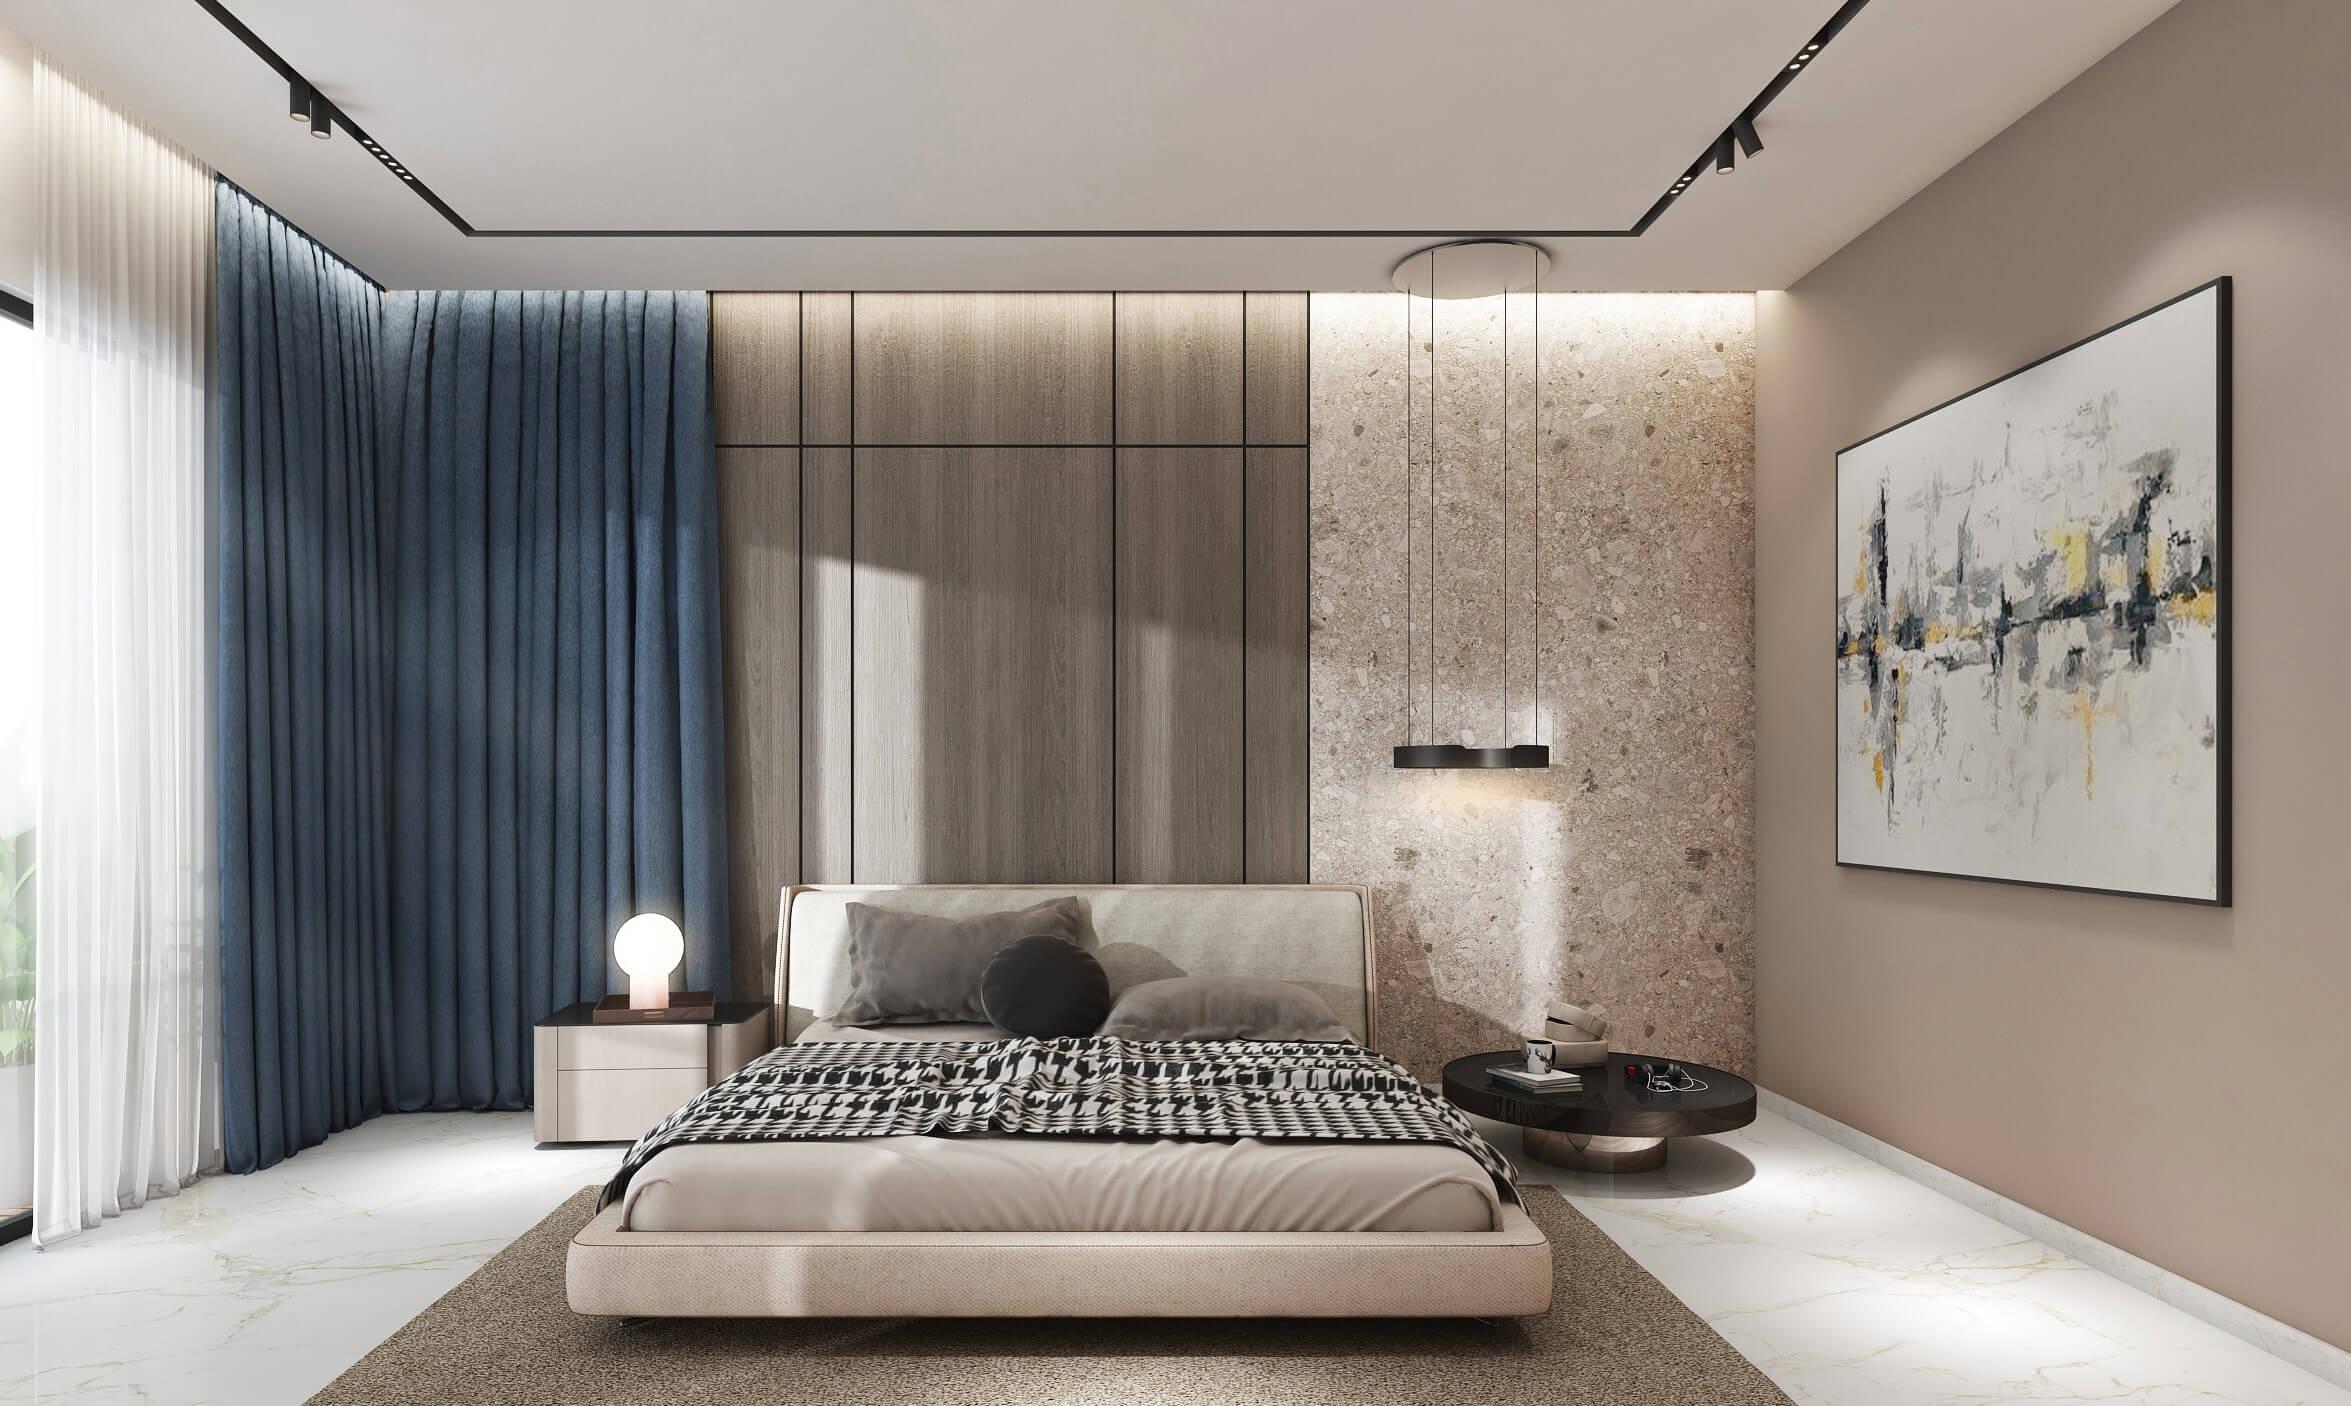 Restful Bedrooms - Image 2